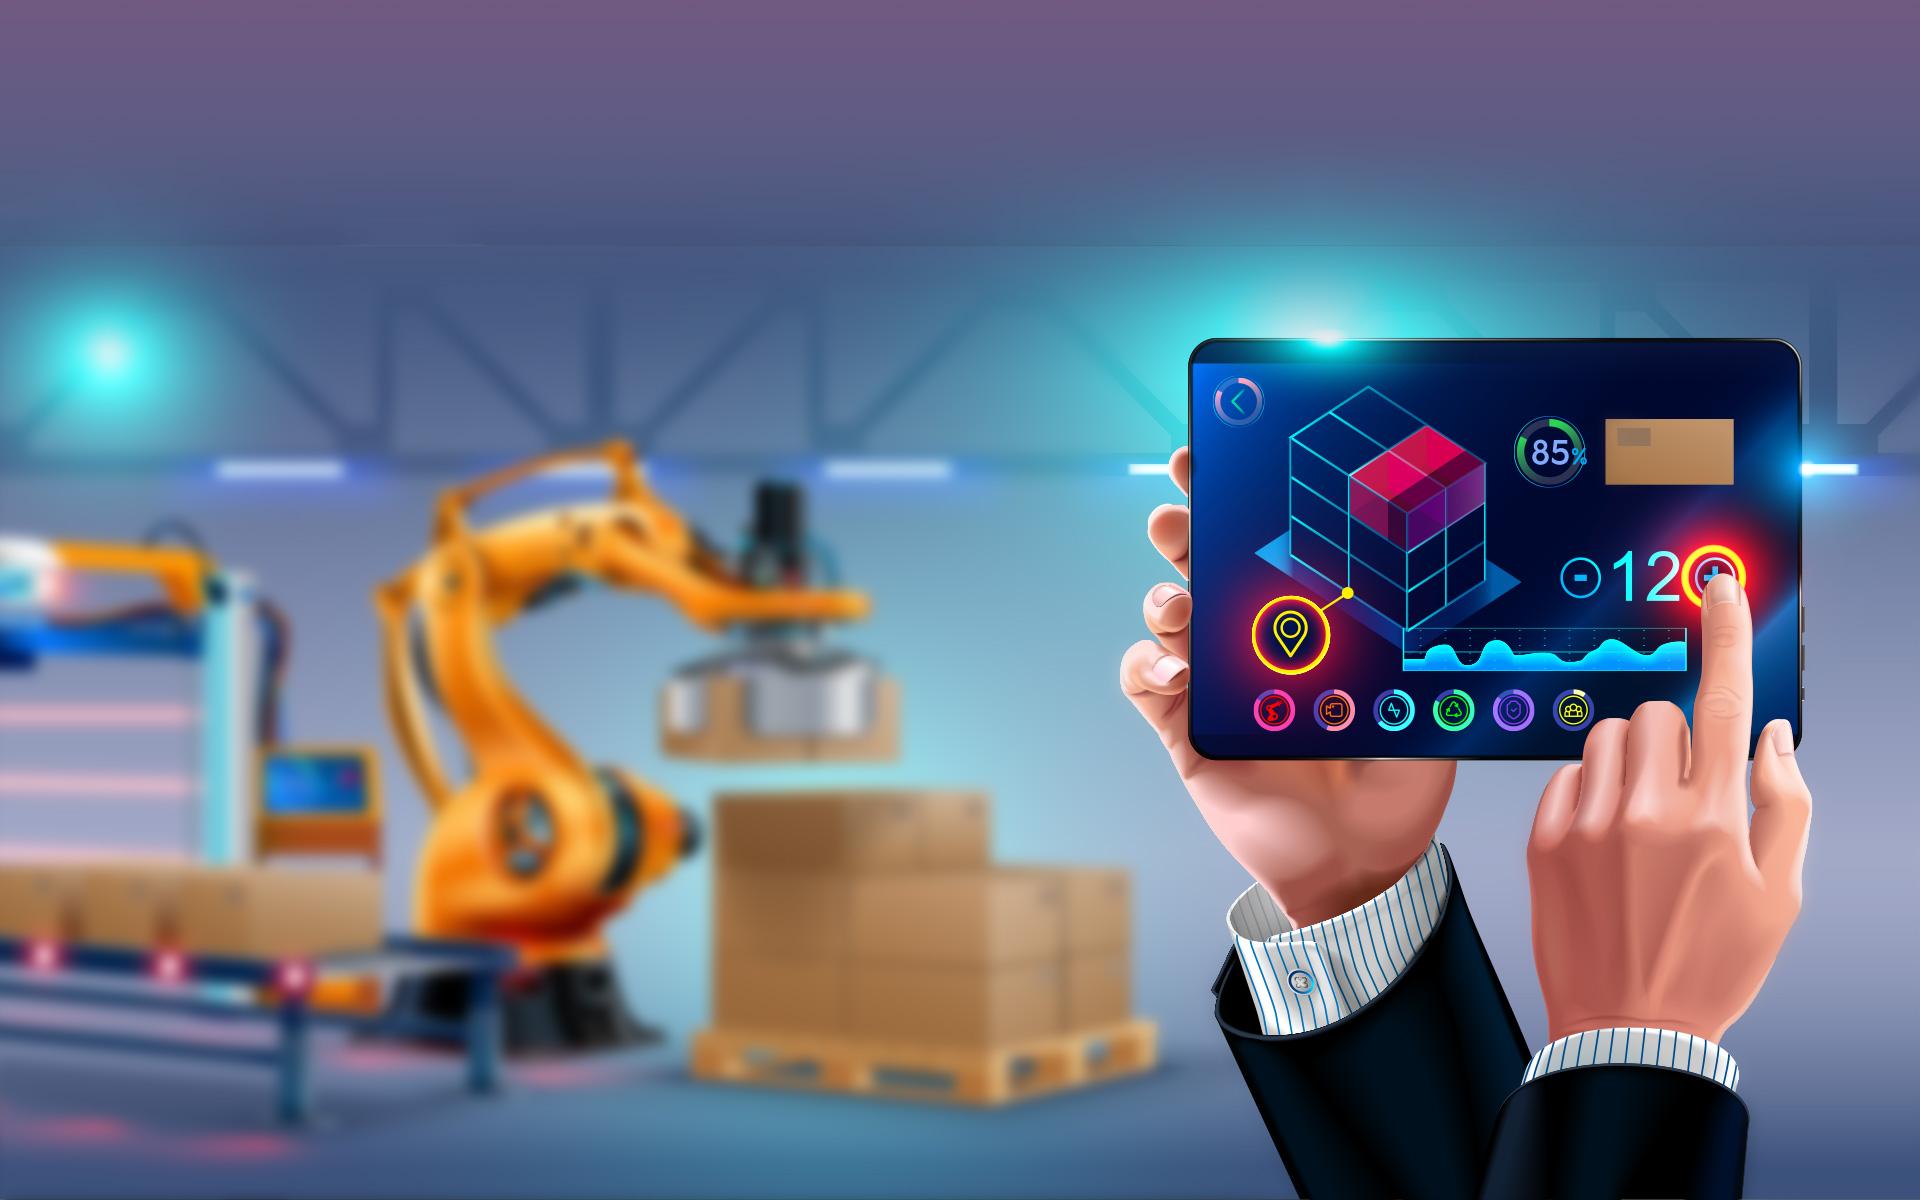 Webinar Warehouse Management Systeme als Software as a Service -Lösung (SAAS) in der Cloud